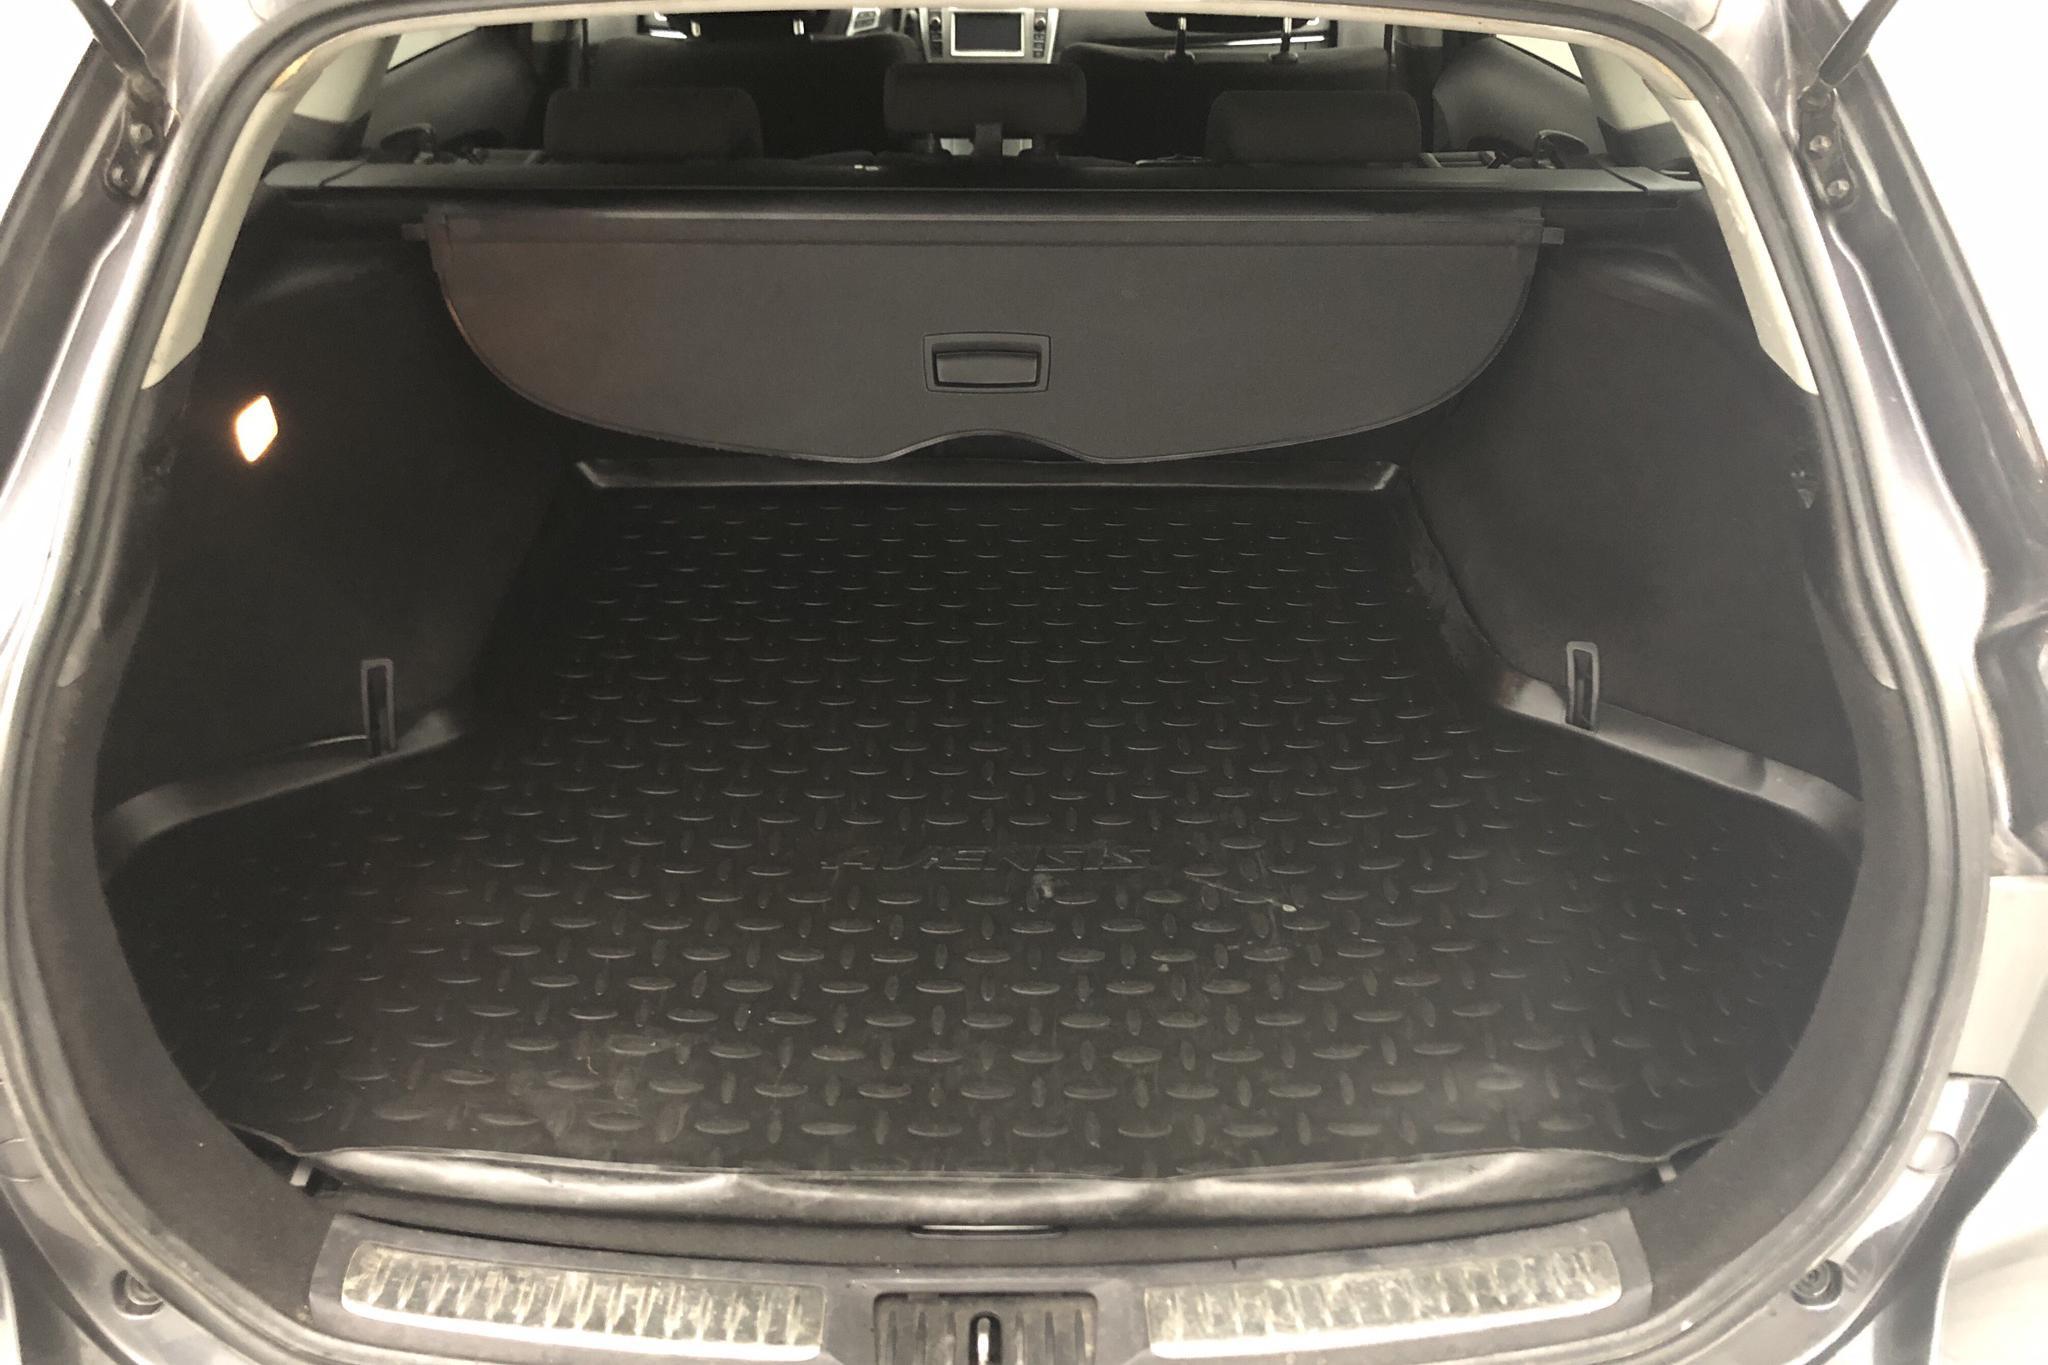 Toyota Avensis 2.0 D-4D Kombi (124hk) - 16 704 mil - Manuell - Dark Grey - 2012